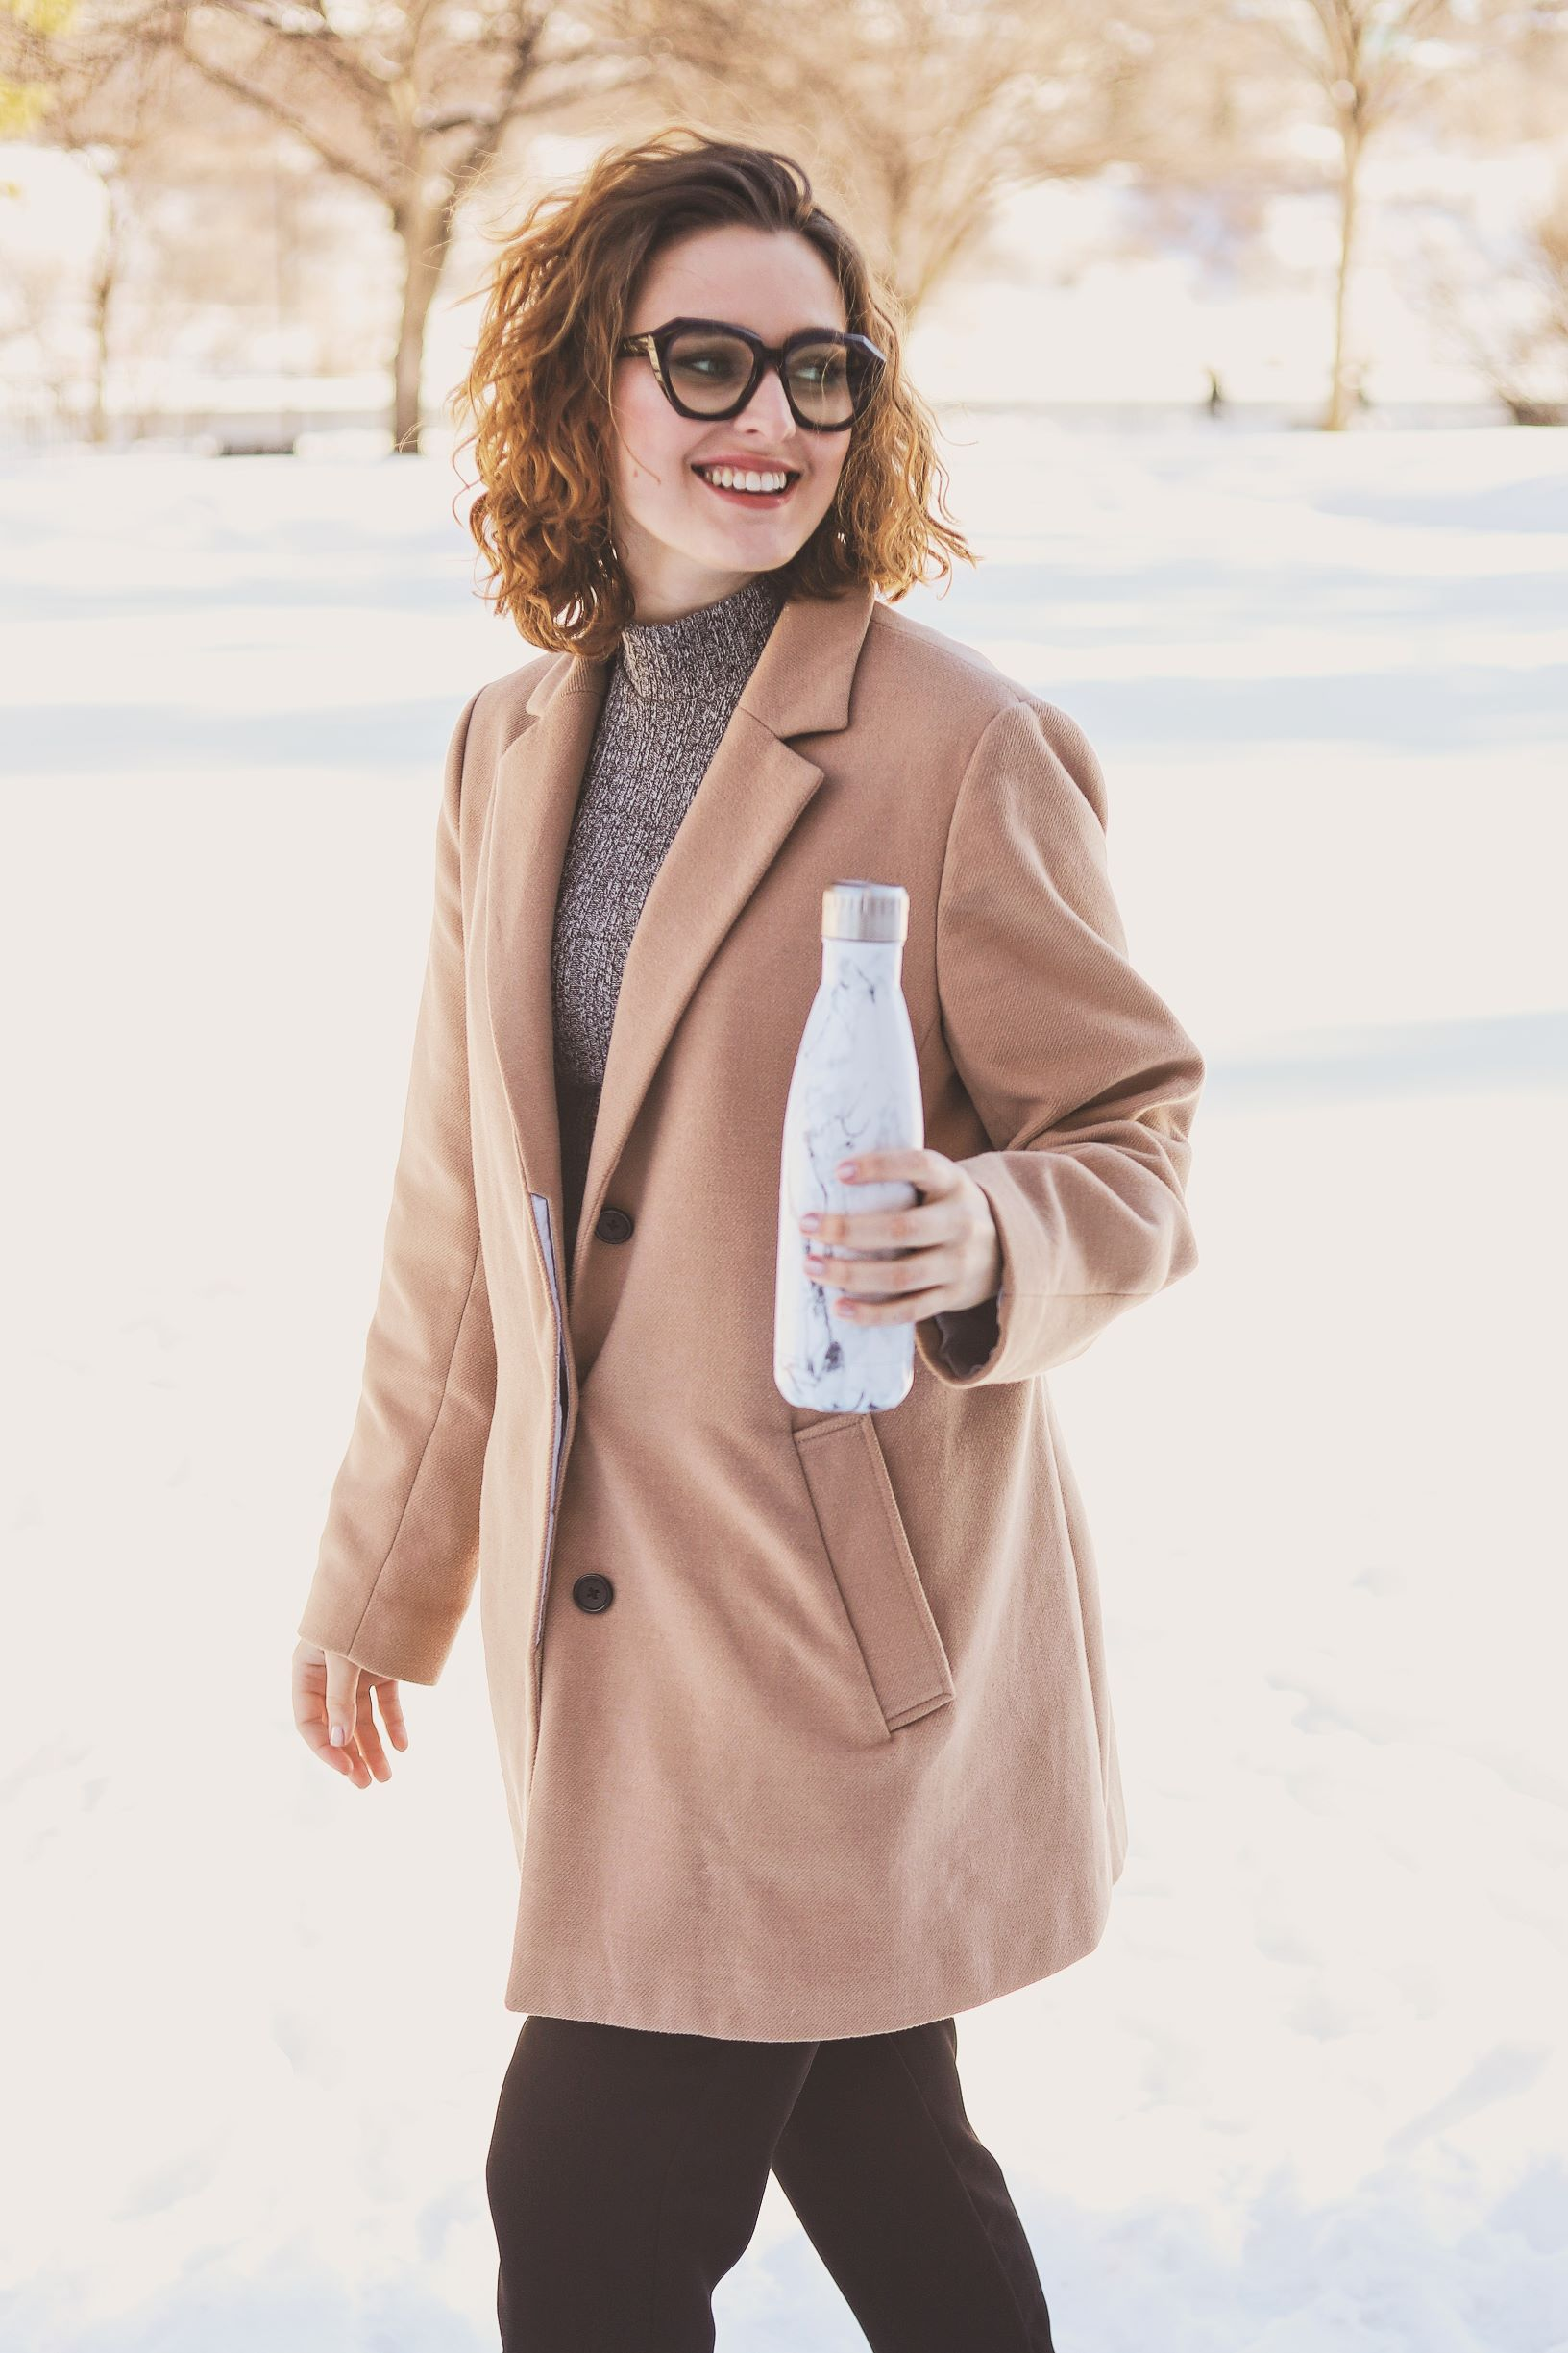 LeClair Organics Coffee Saskatoon, Coffee Roaster Saskatoon commercial photography with Jenna Rozlin 16